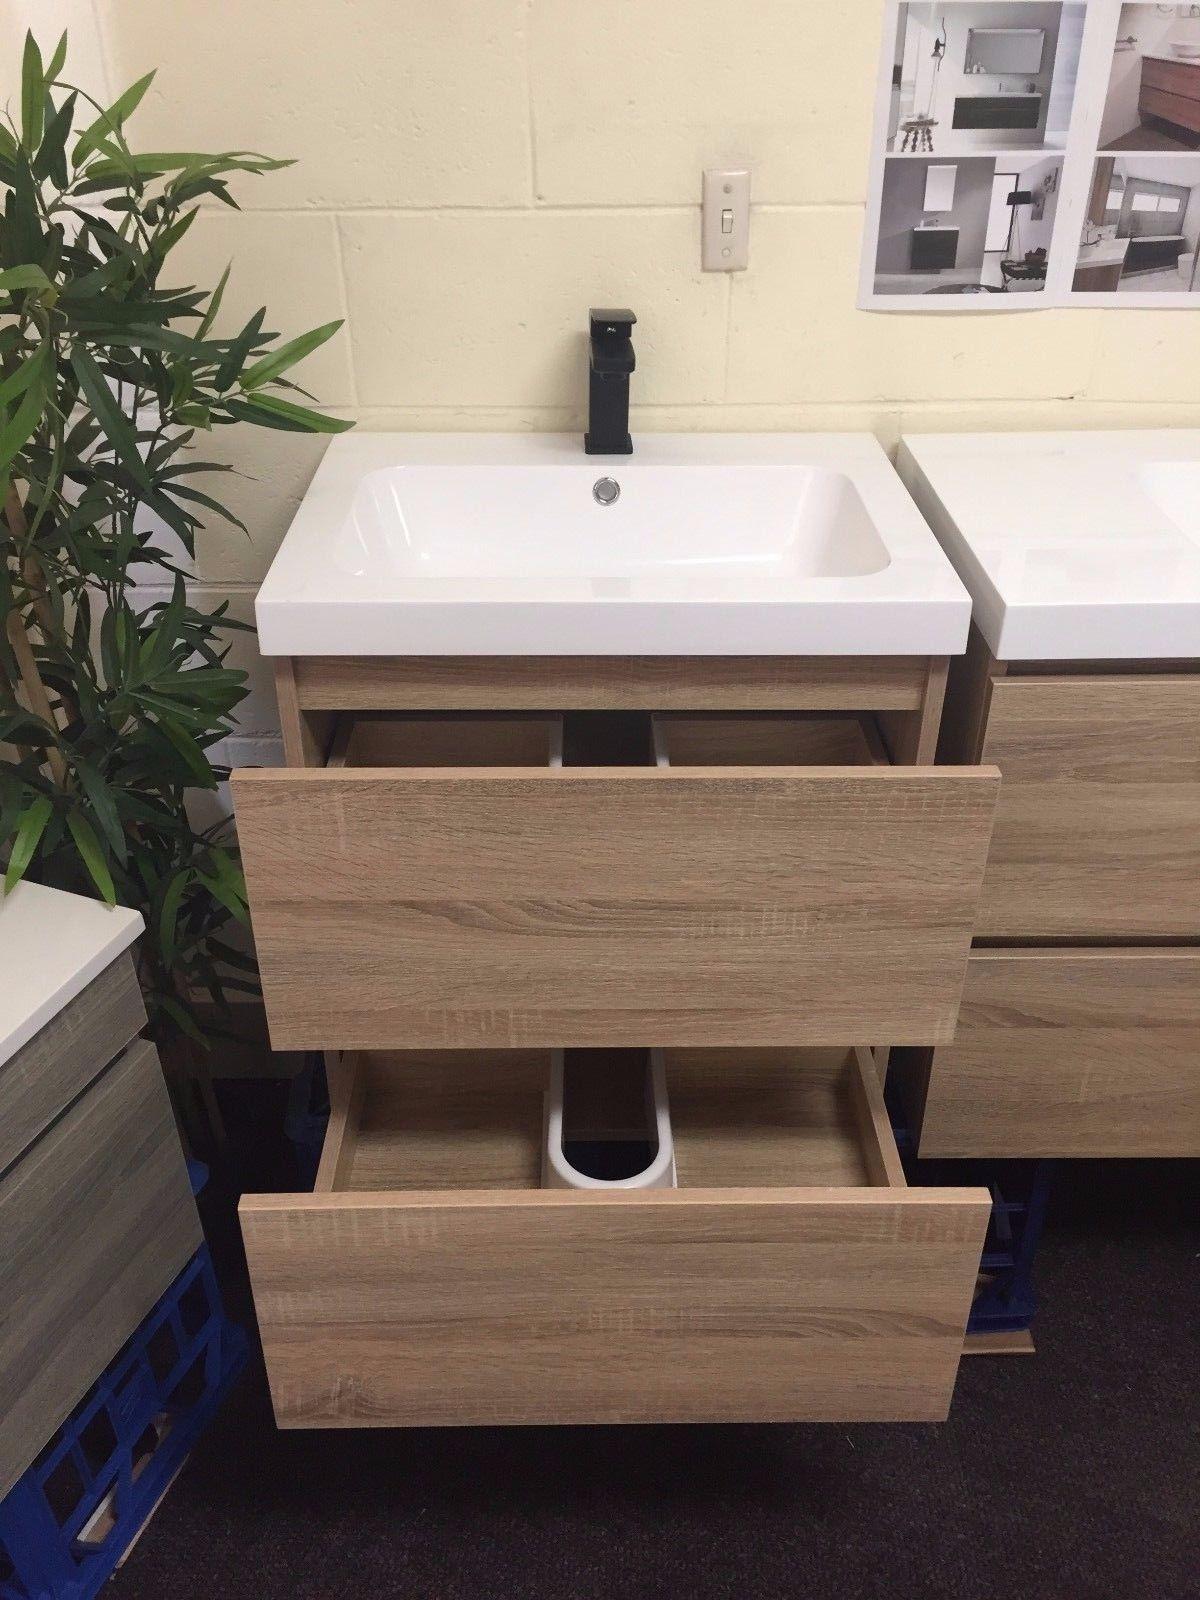 Bogetta 600mm White Oak Timber Wood Grain Bathroom